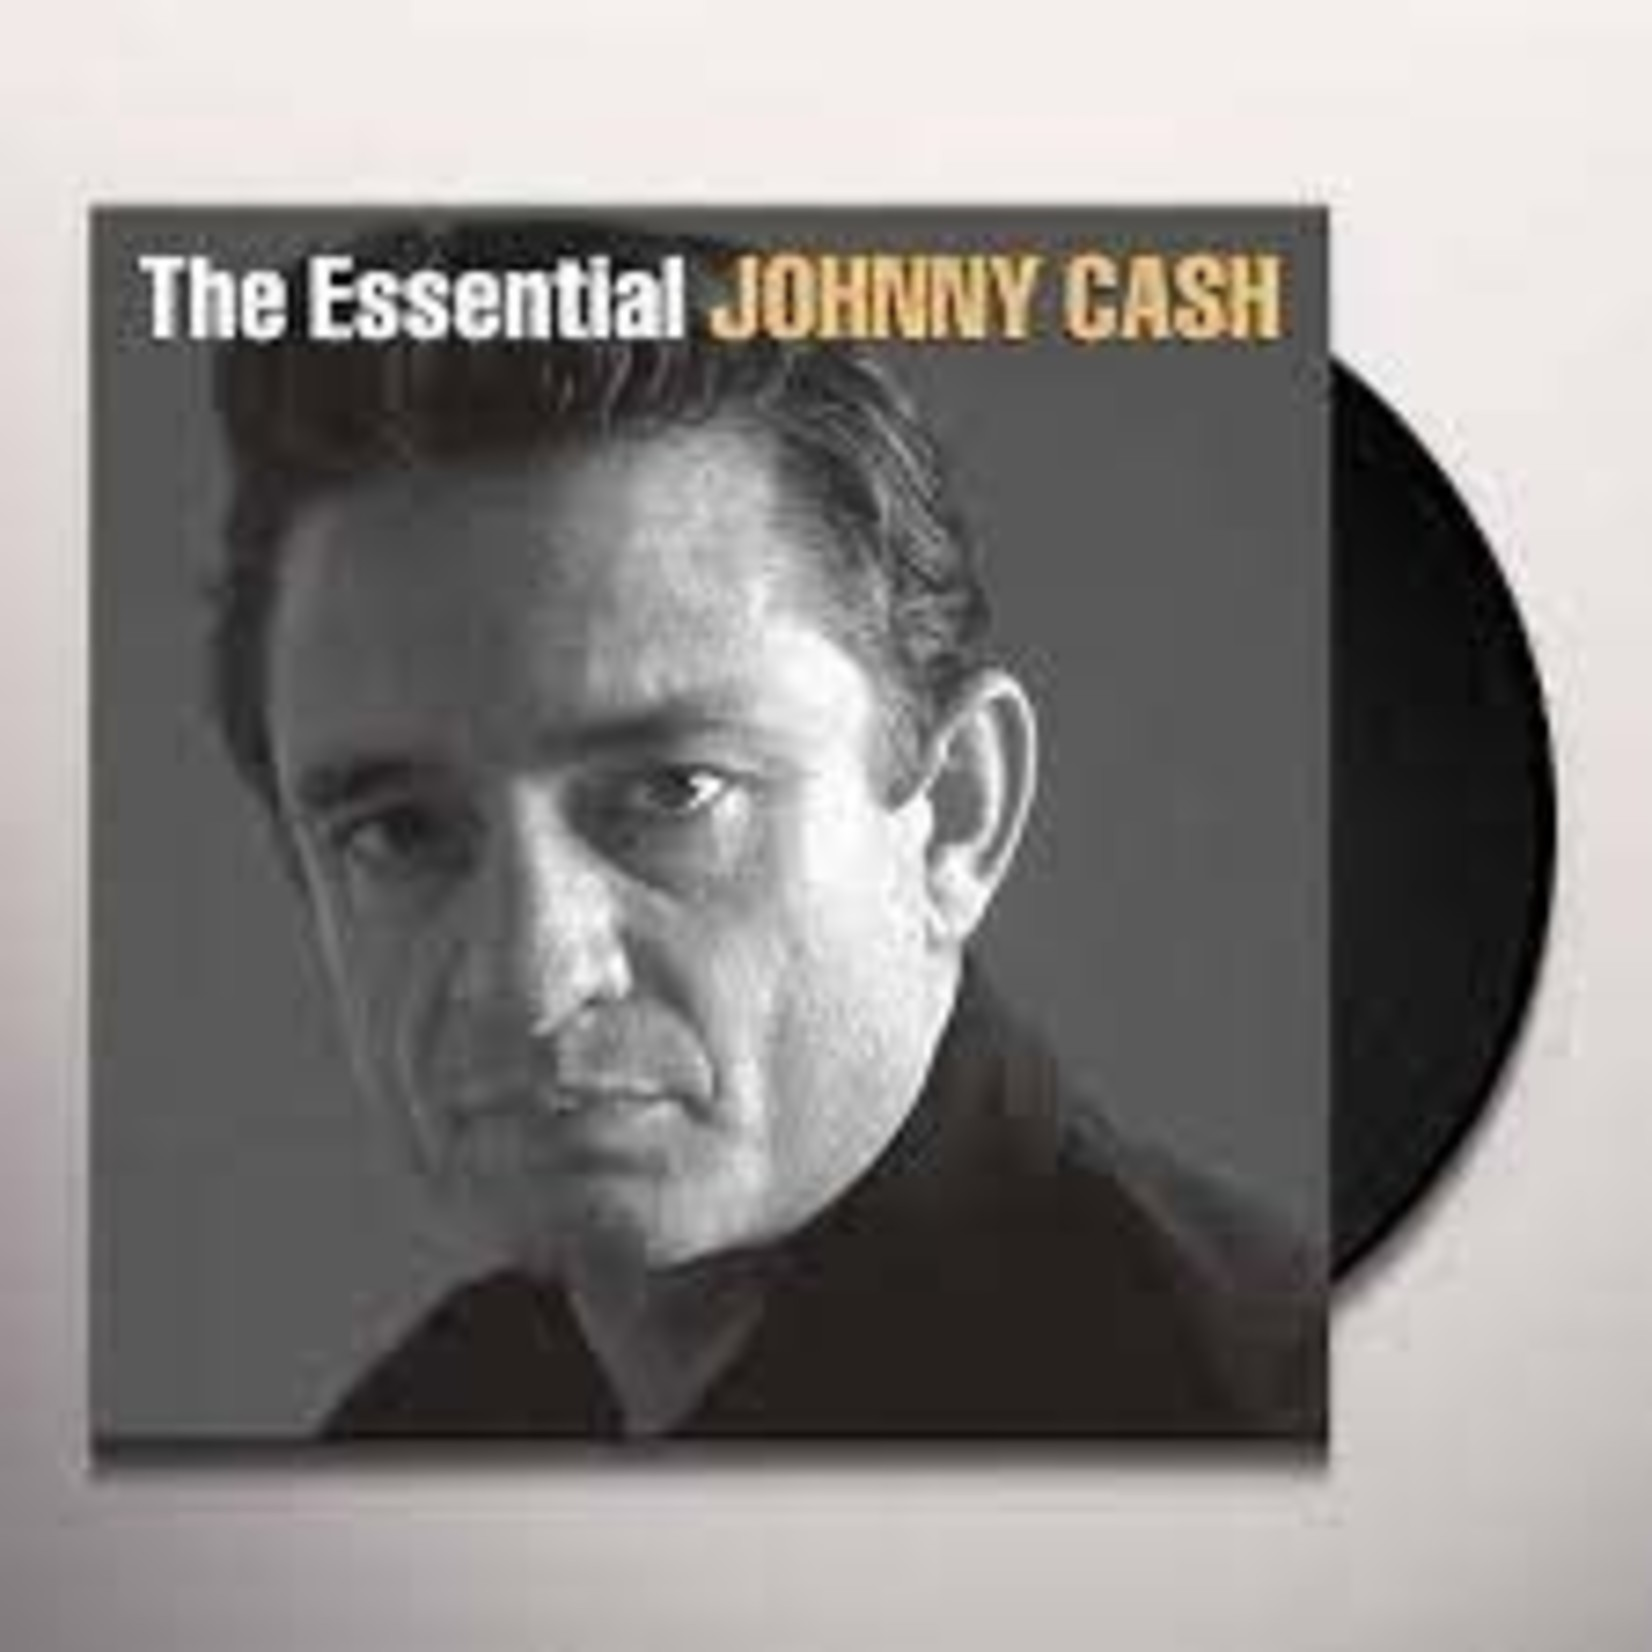 JOHNNY CASH - THE ESSENTIAL JOHNNY CASH 2LP (VINYL)